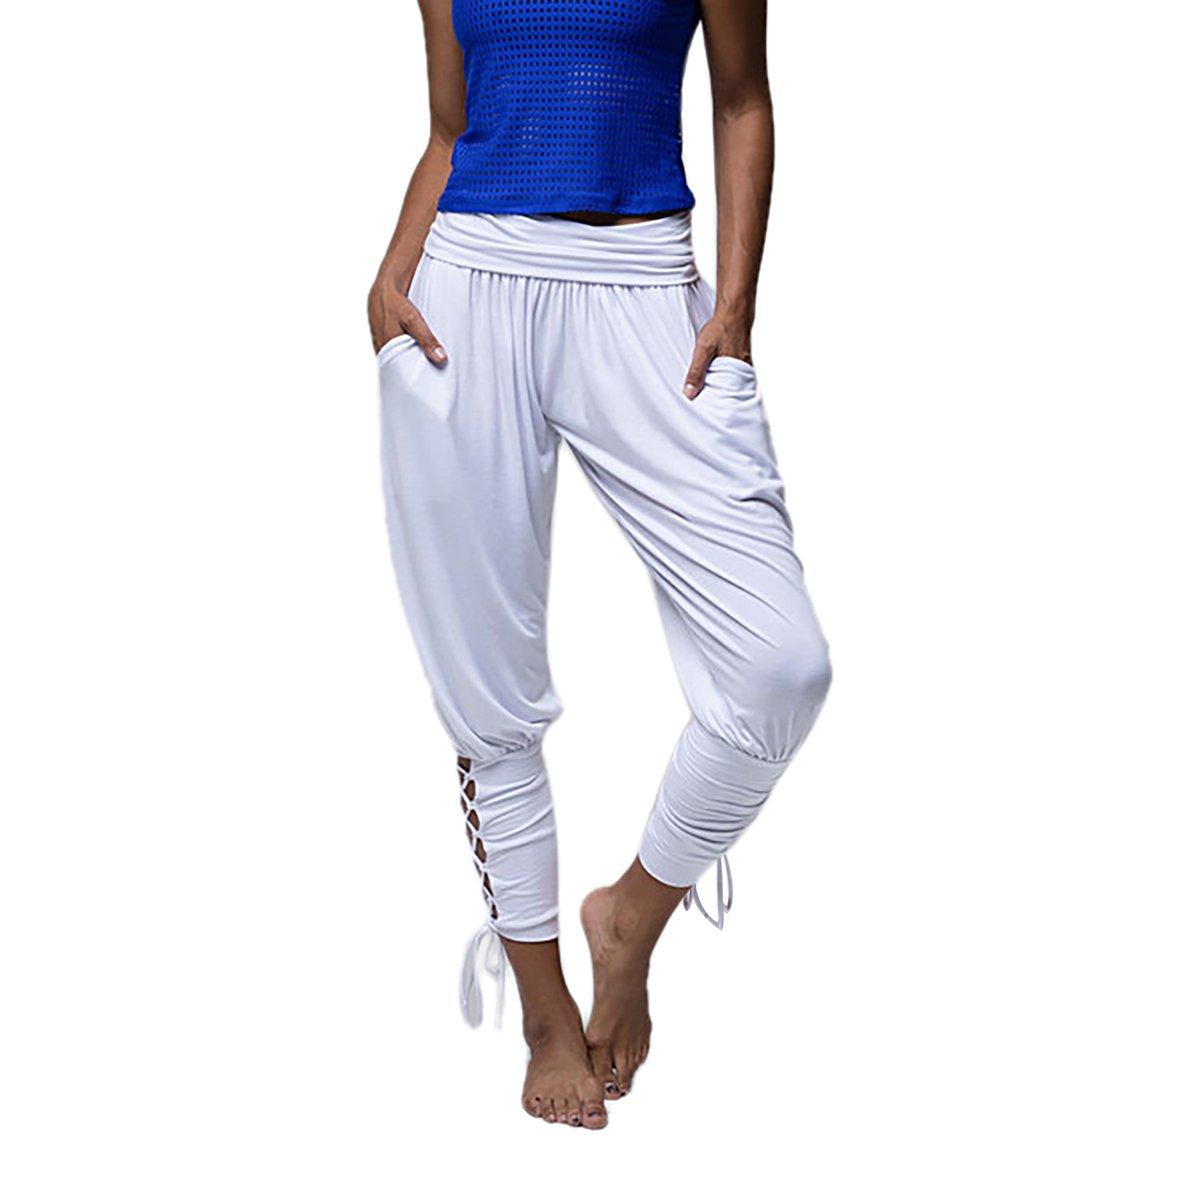 CZ Women Yoga Pants Athletic Trousers